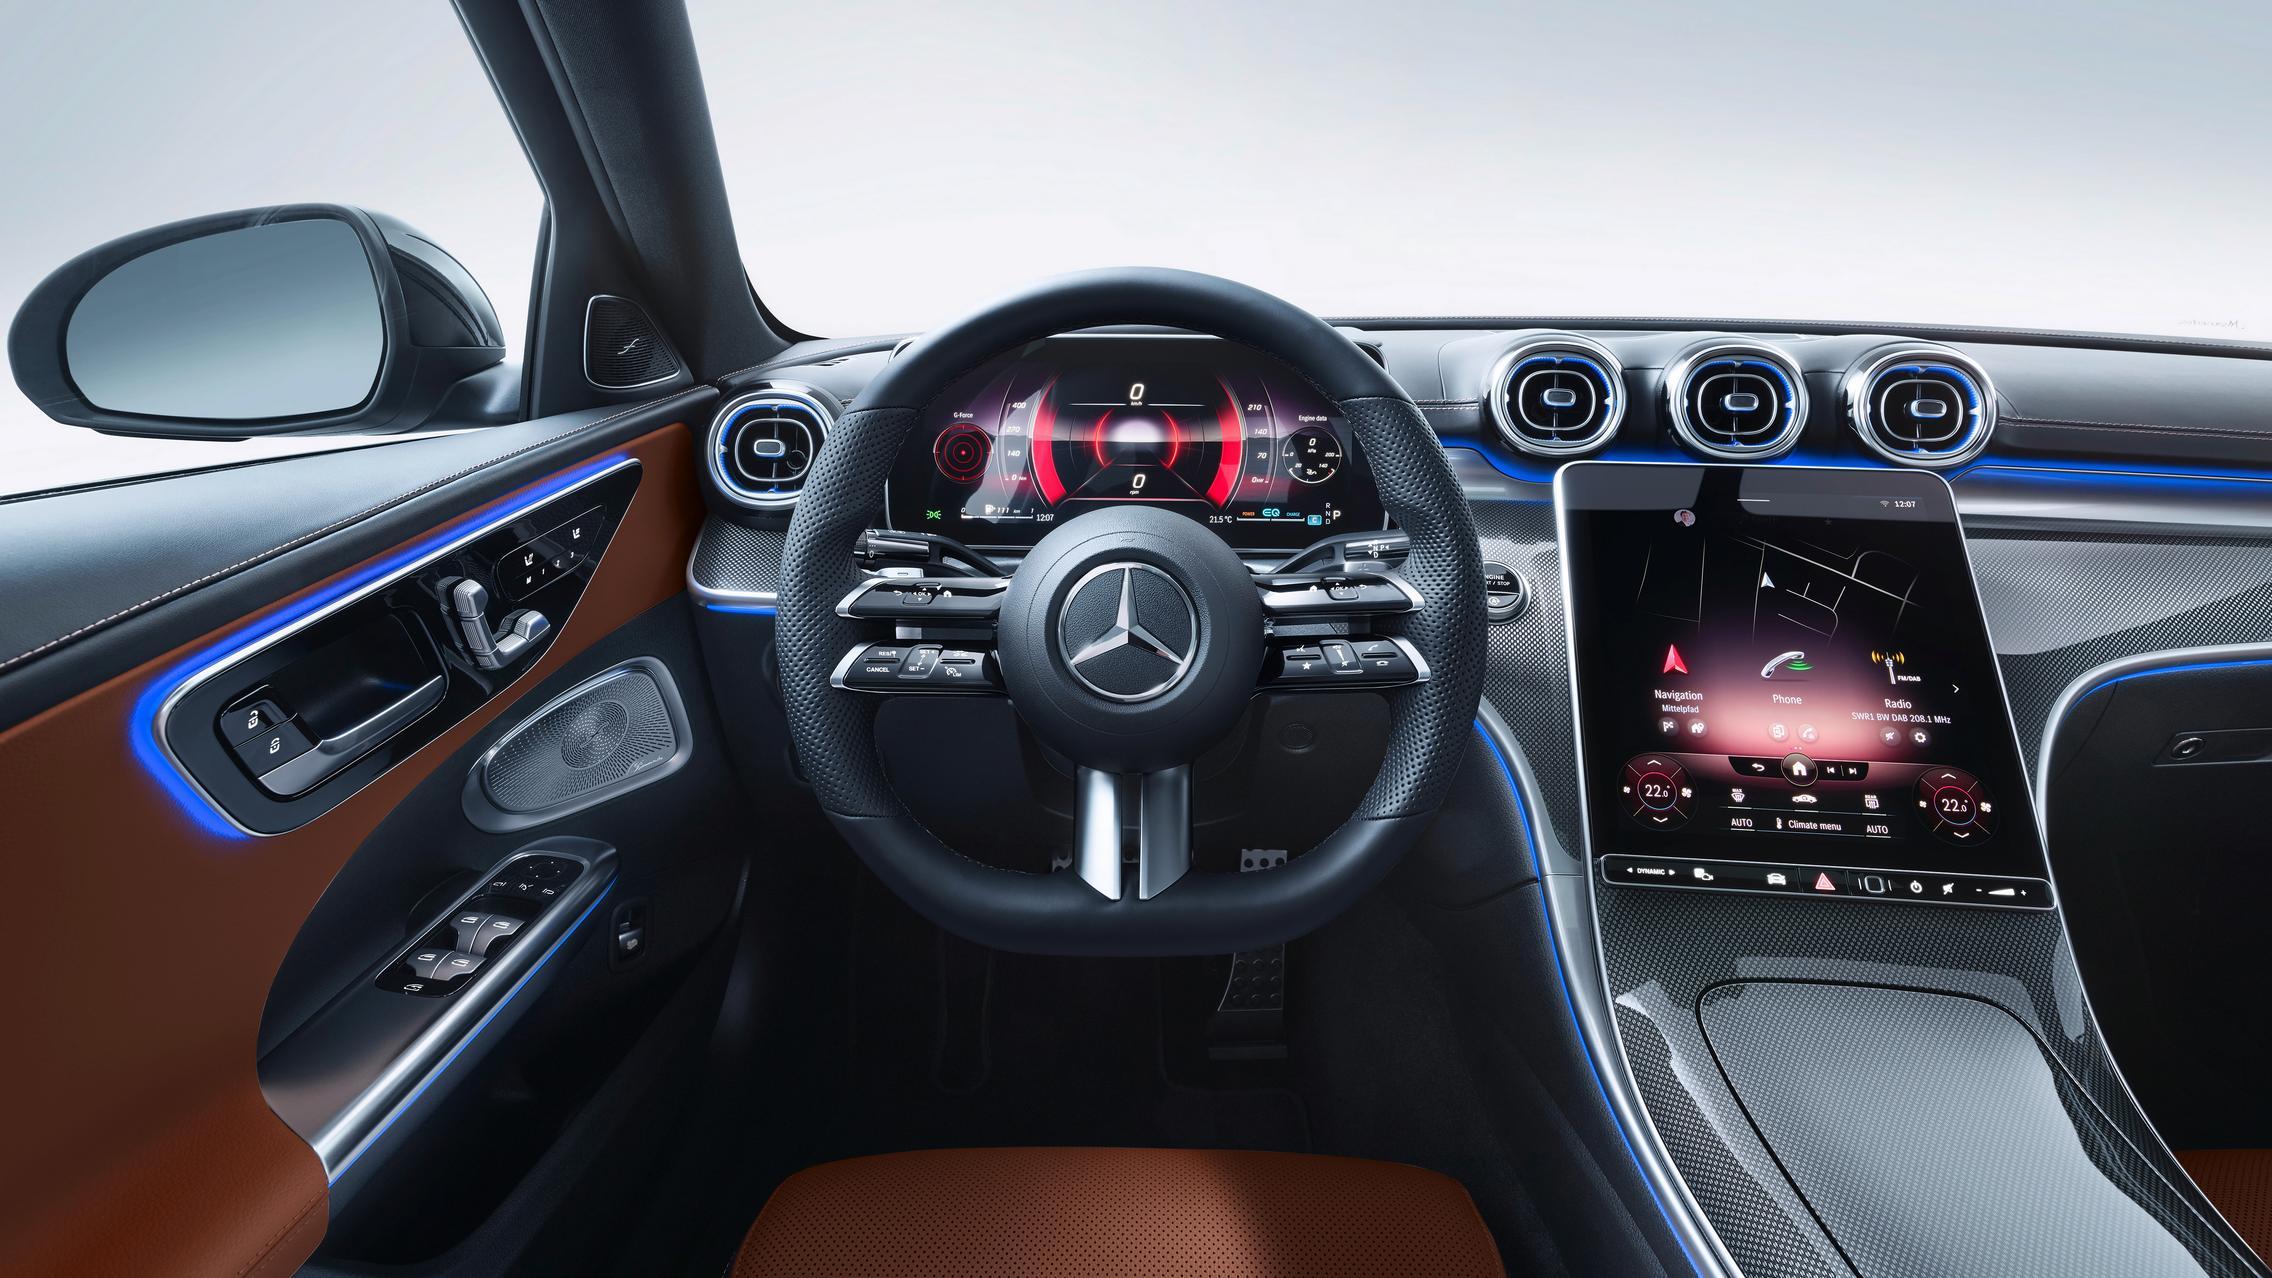 New-W206-C-Class-Interior